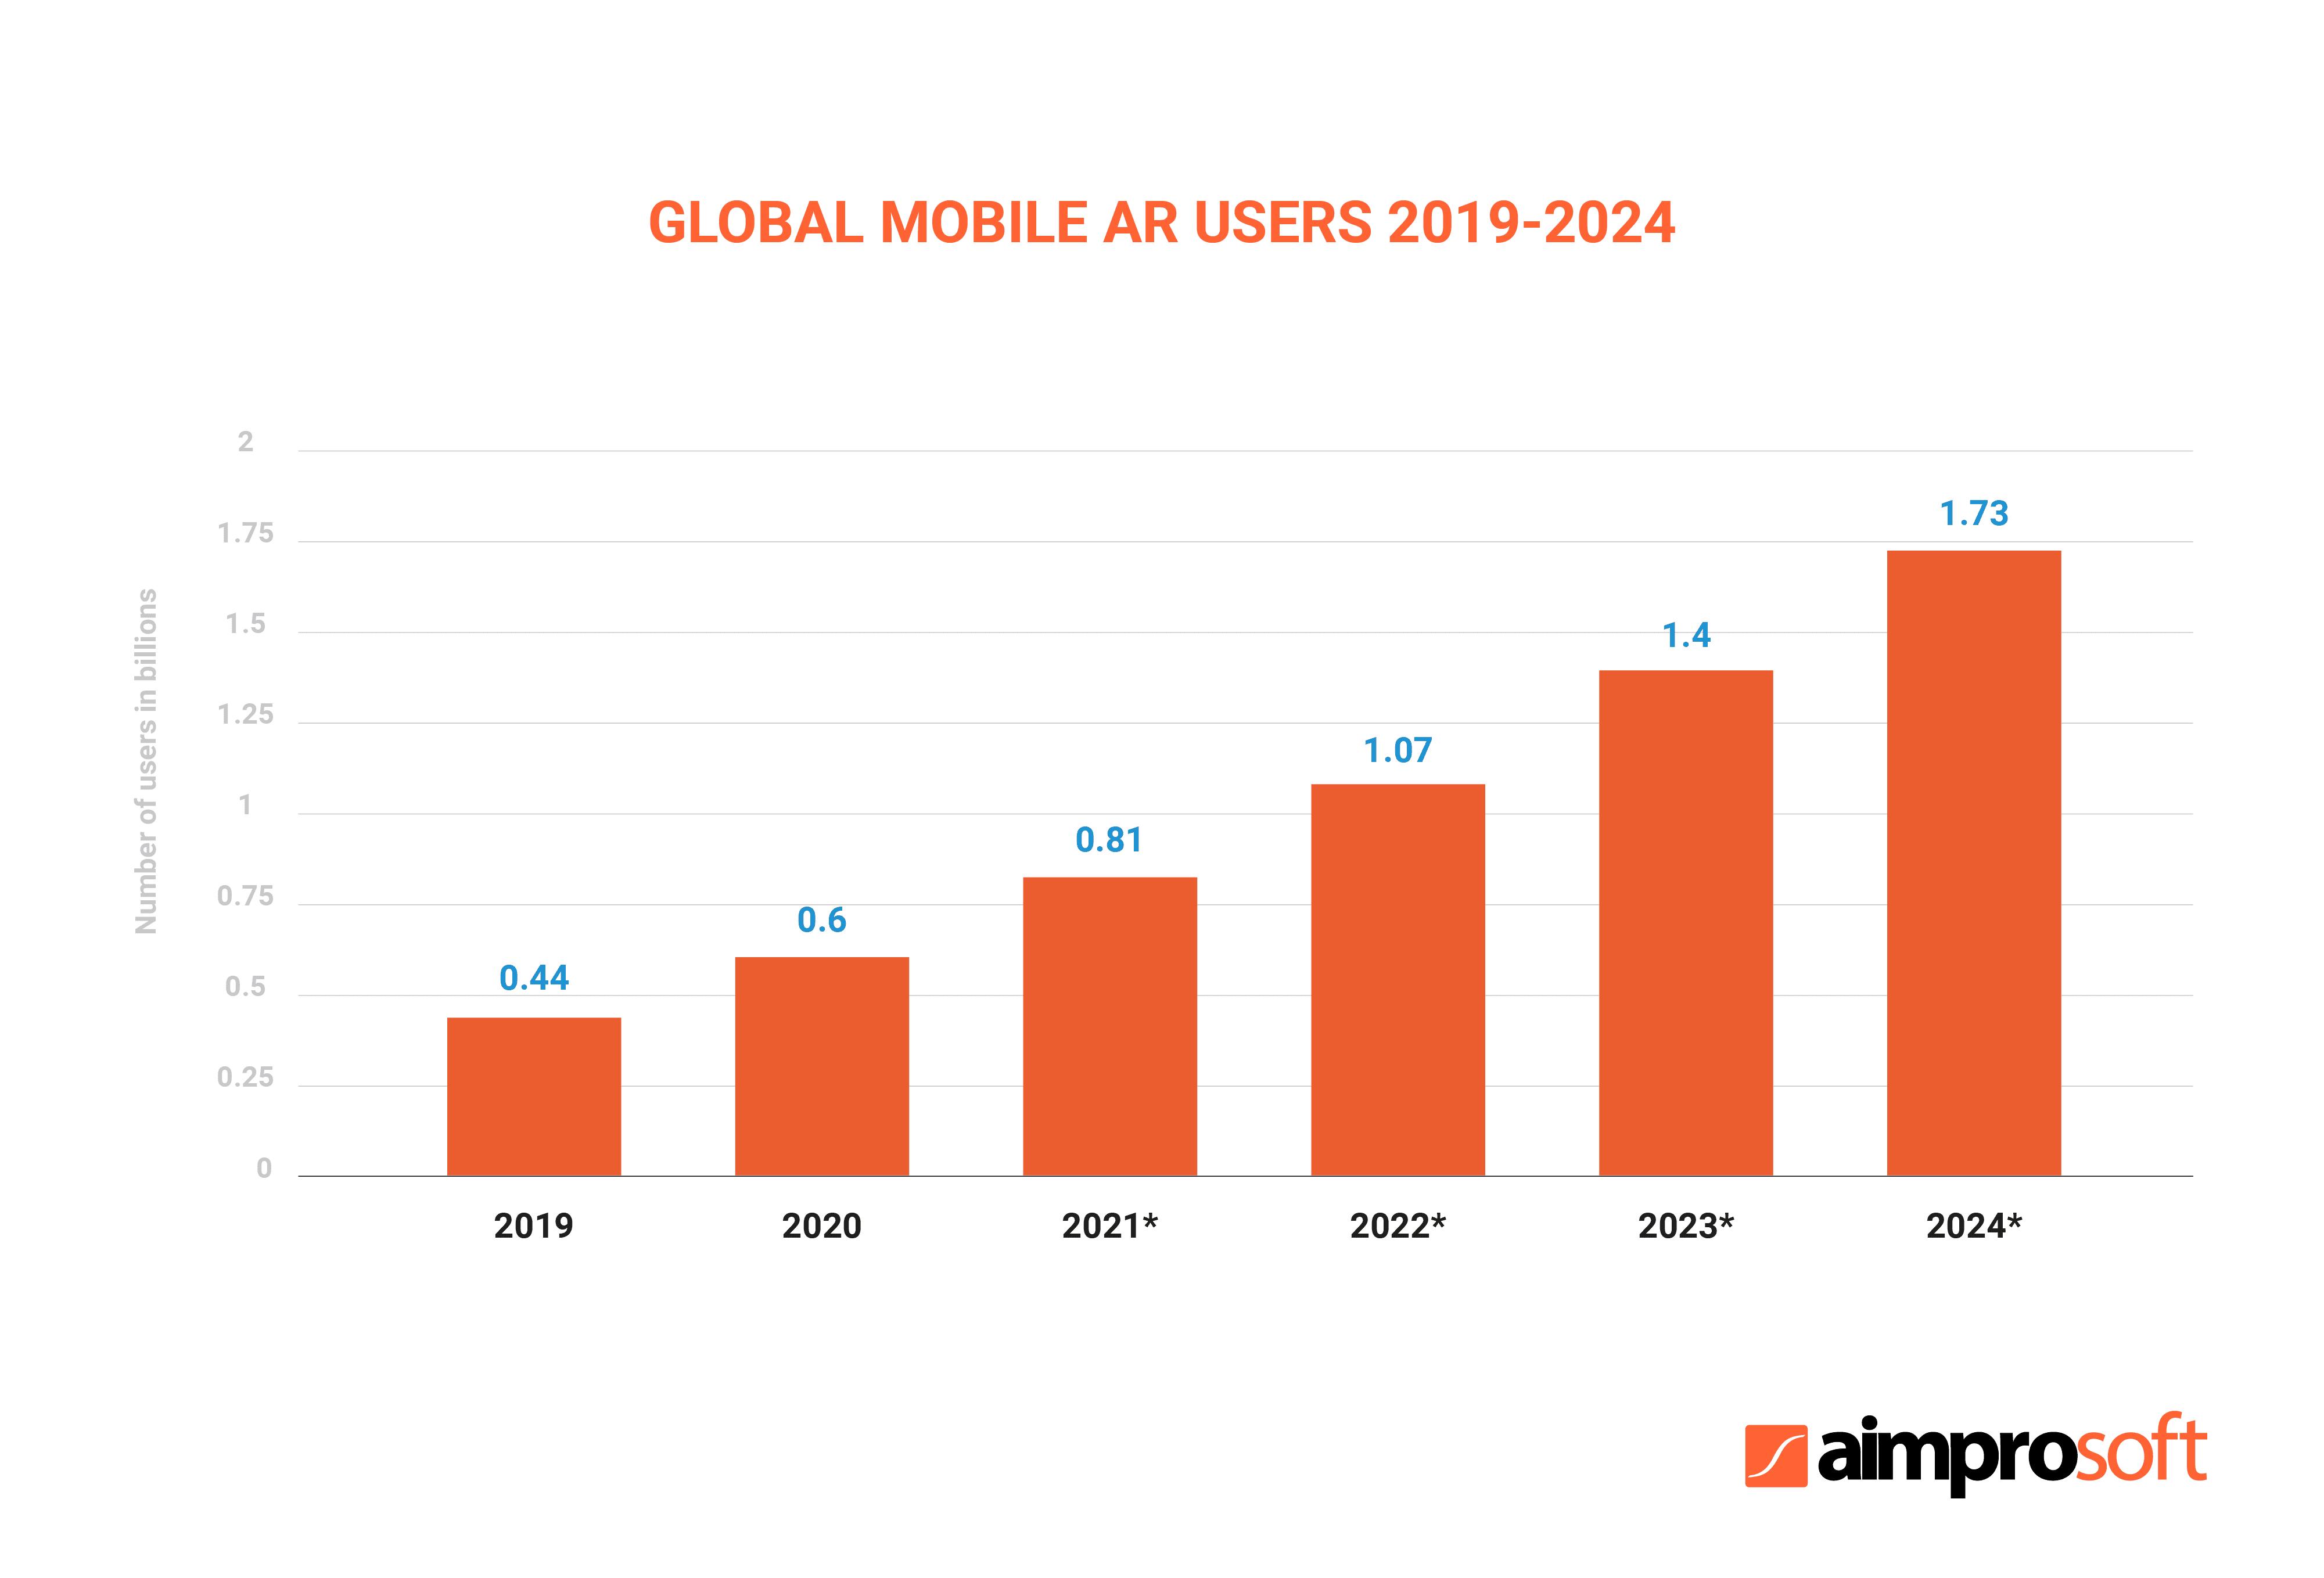 Global mobile AR users, 2019-2024